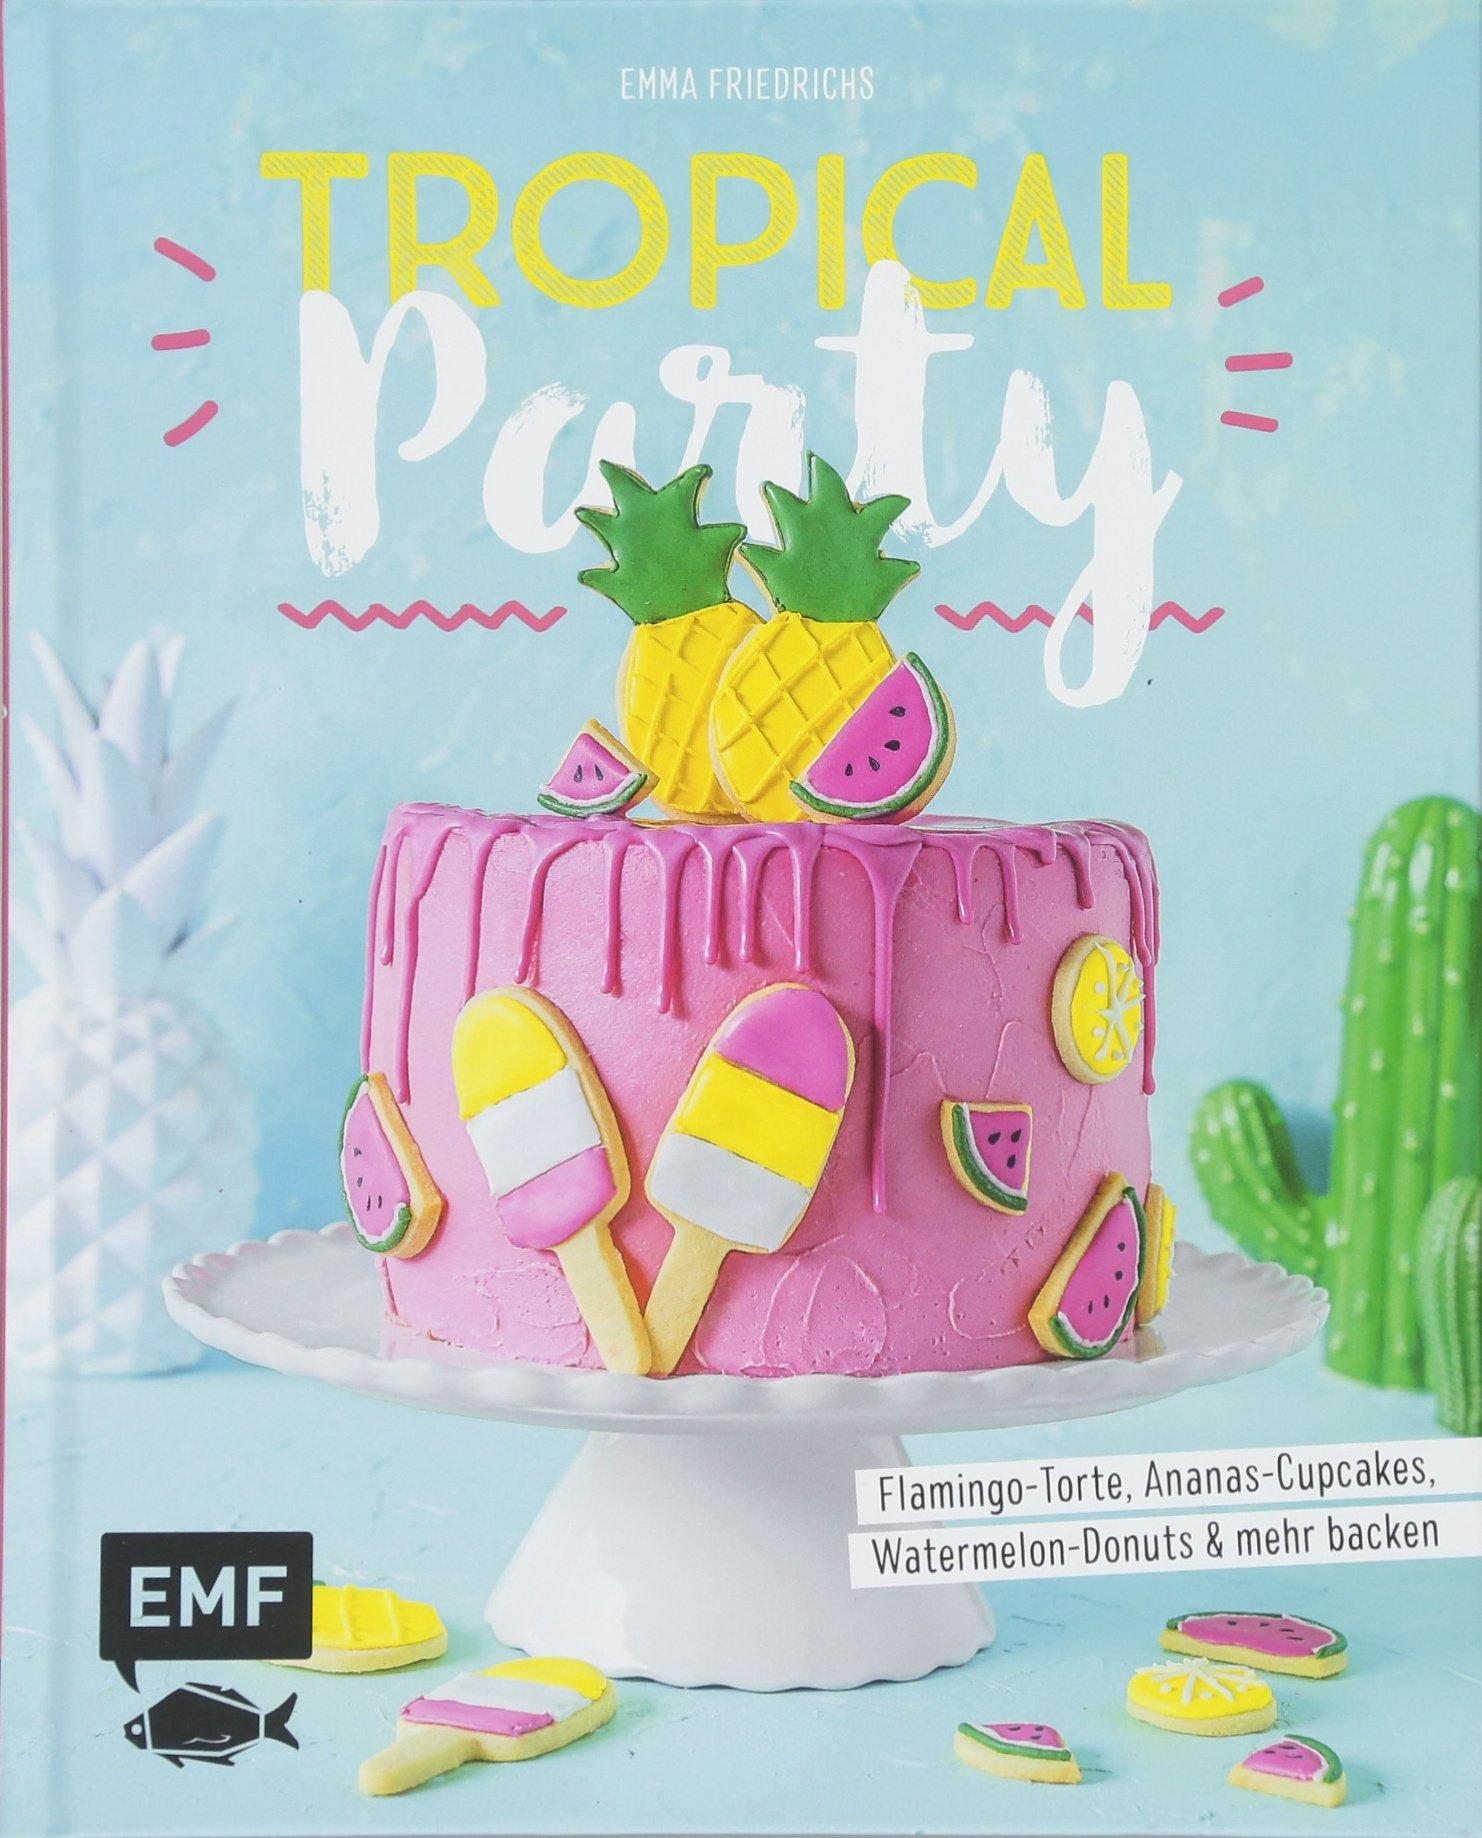 Tropical Party: Flamingo-Torte, Ananas-Cupcakes, Watermelon-Donuts und mehr backen